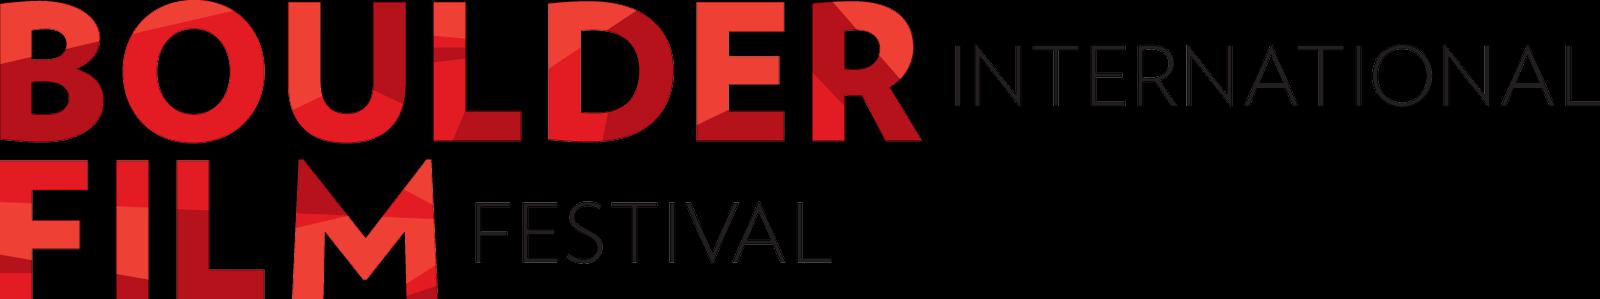 Boulder International Film Festival shorts program